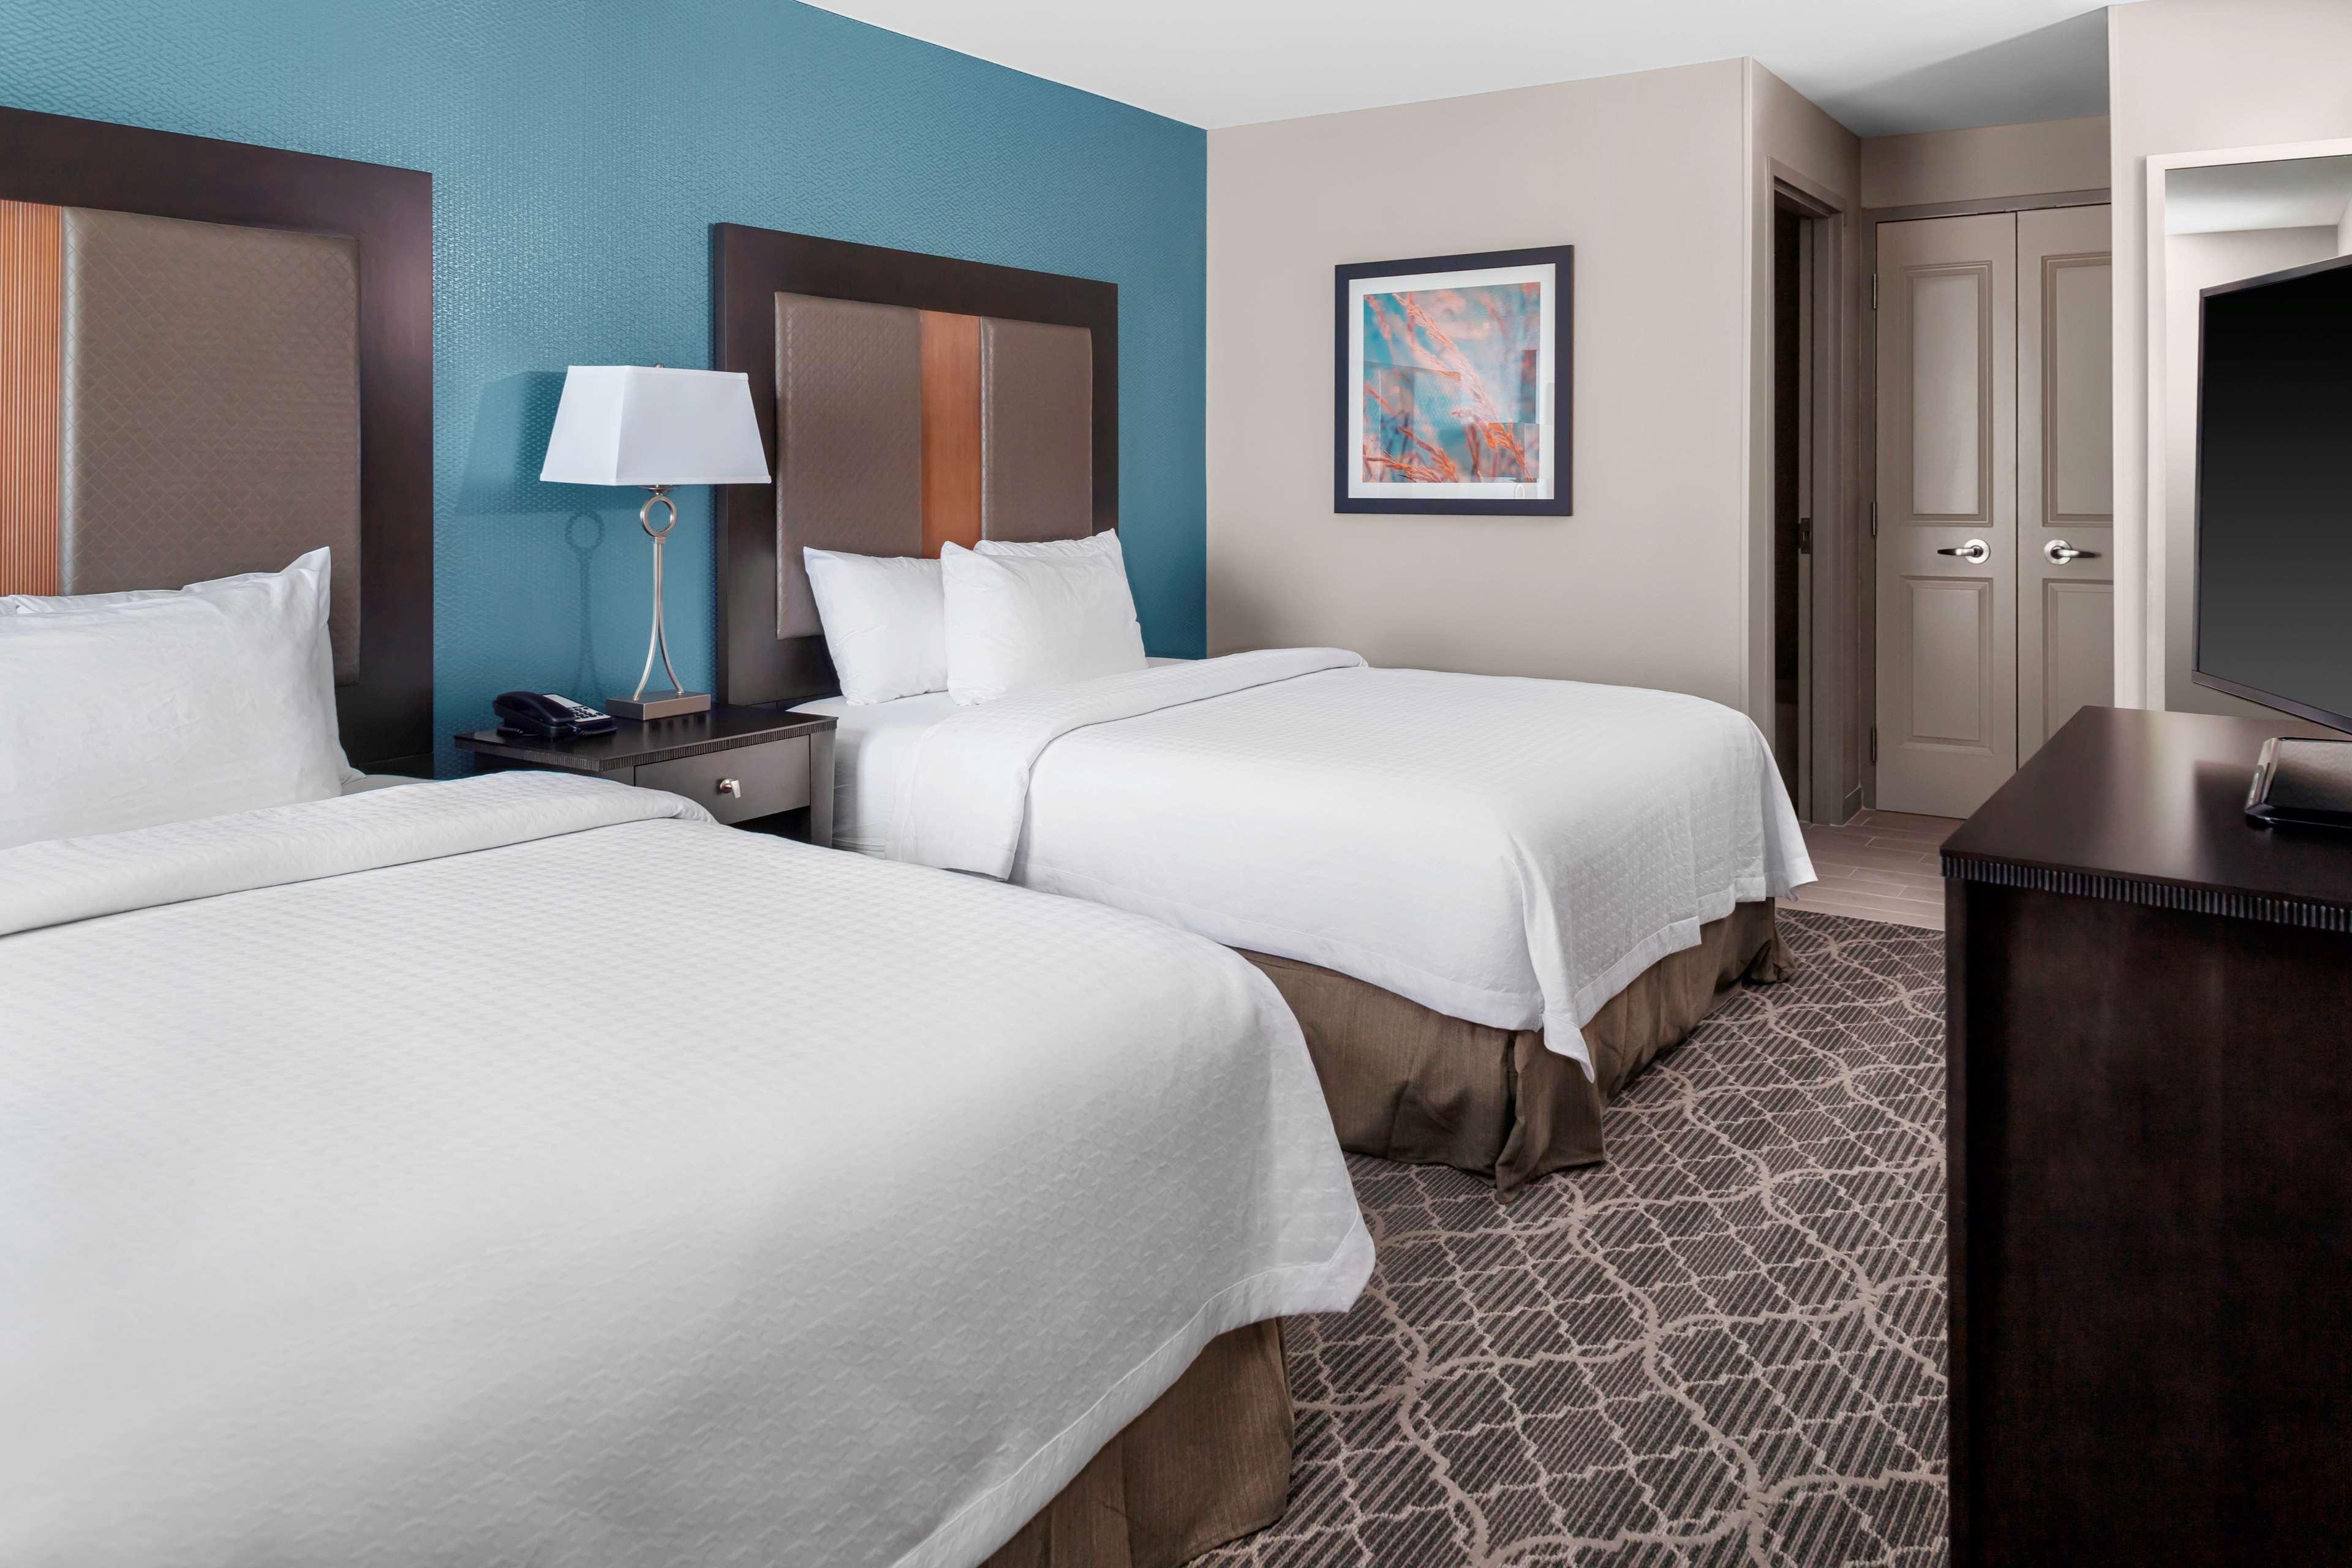 Homewood Suites by Hilton Wauwatosa Milwaukee image 9